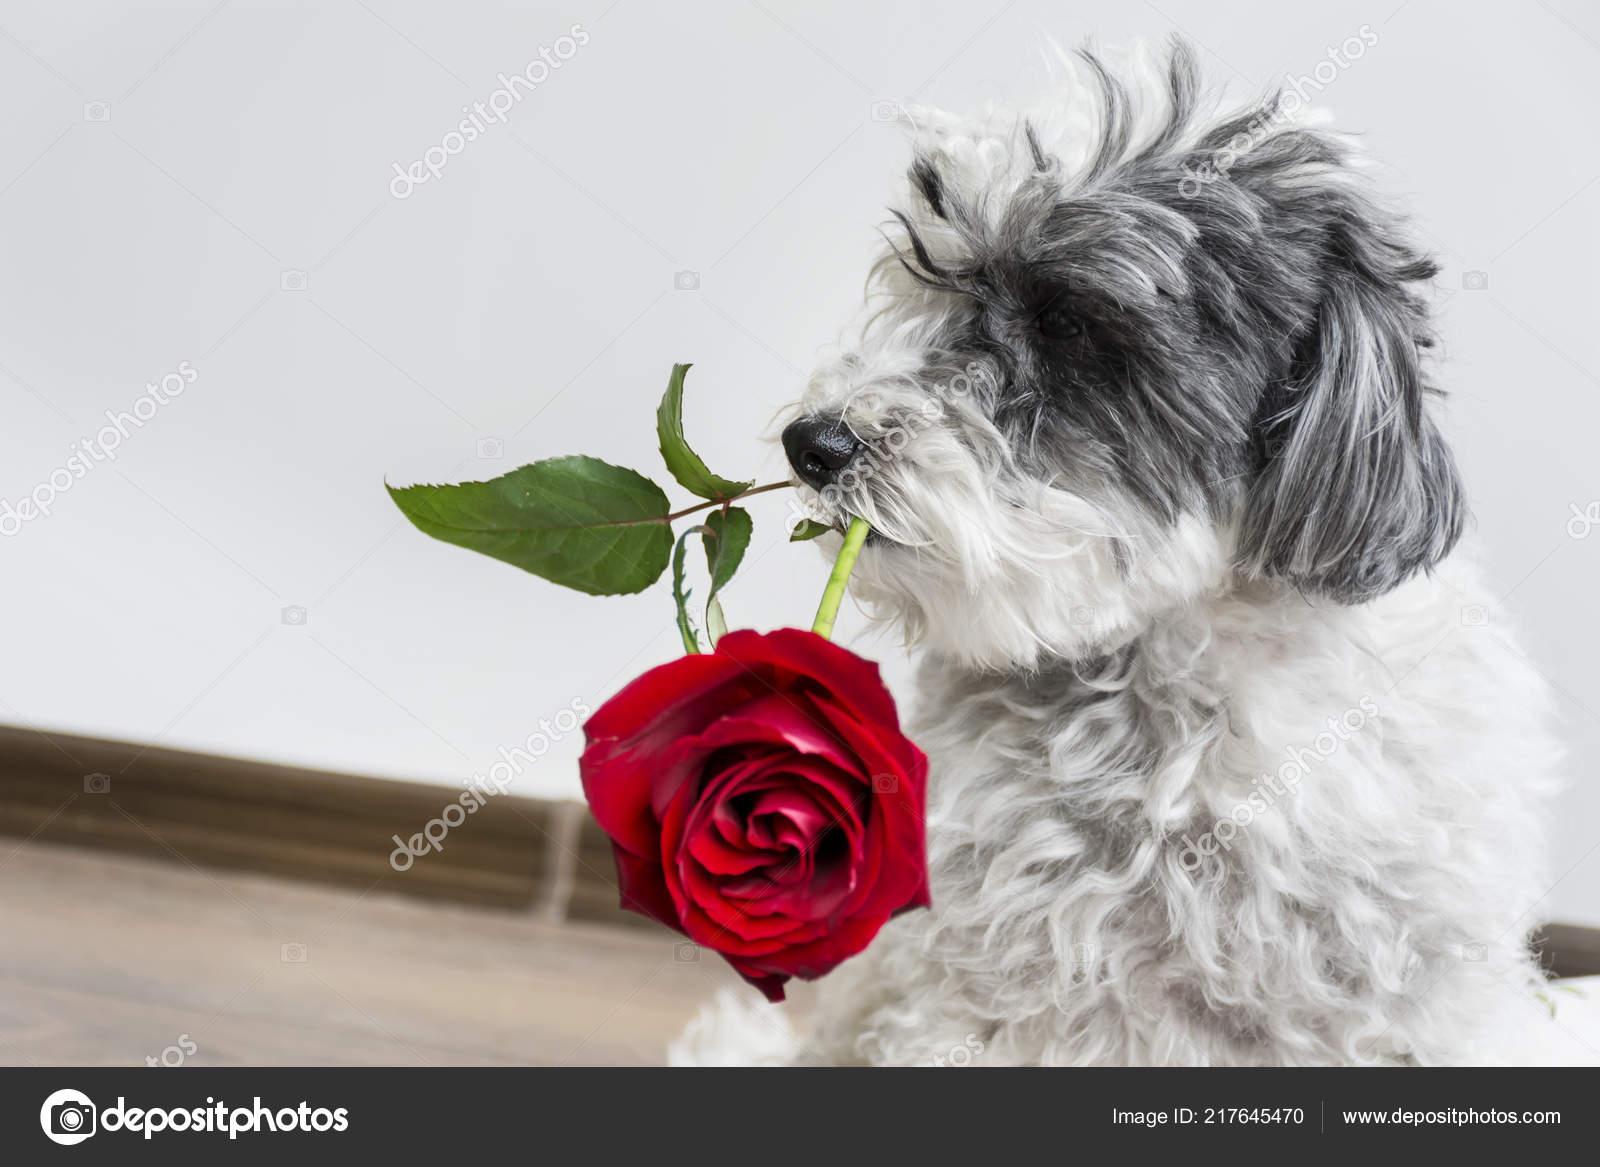 Puppy liefde dating site